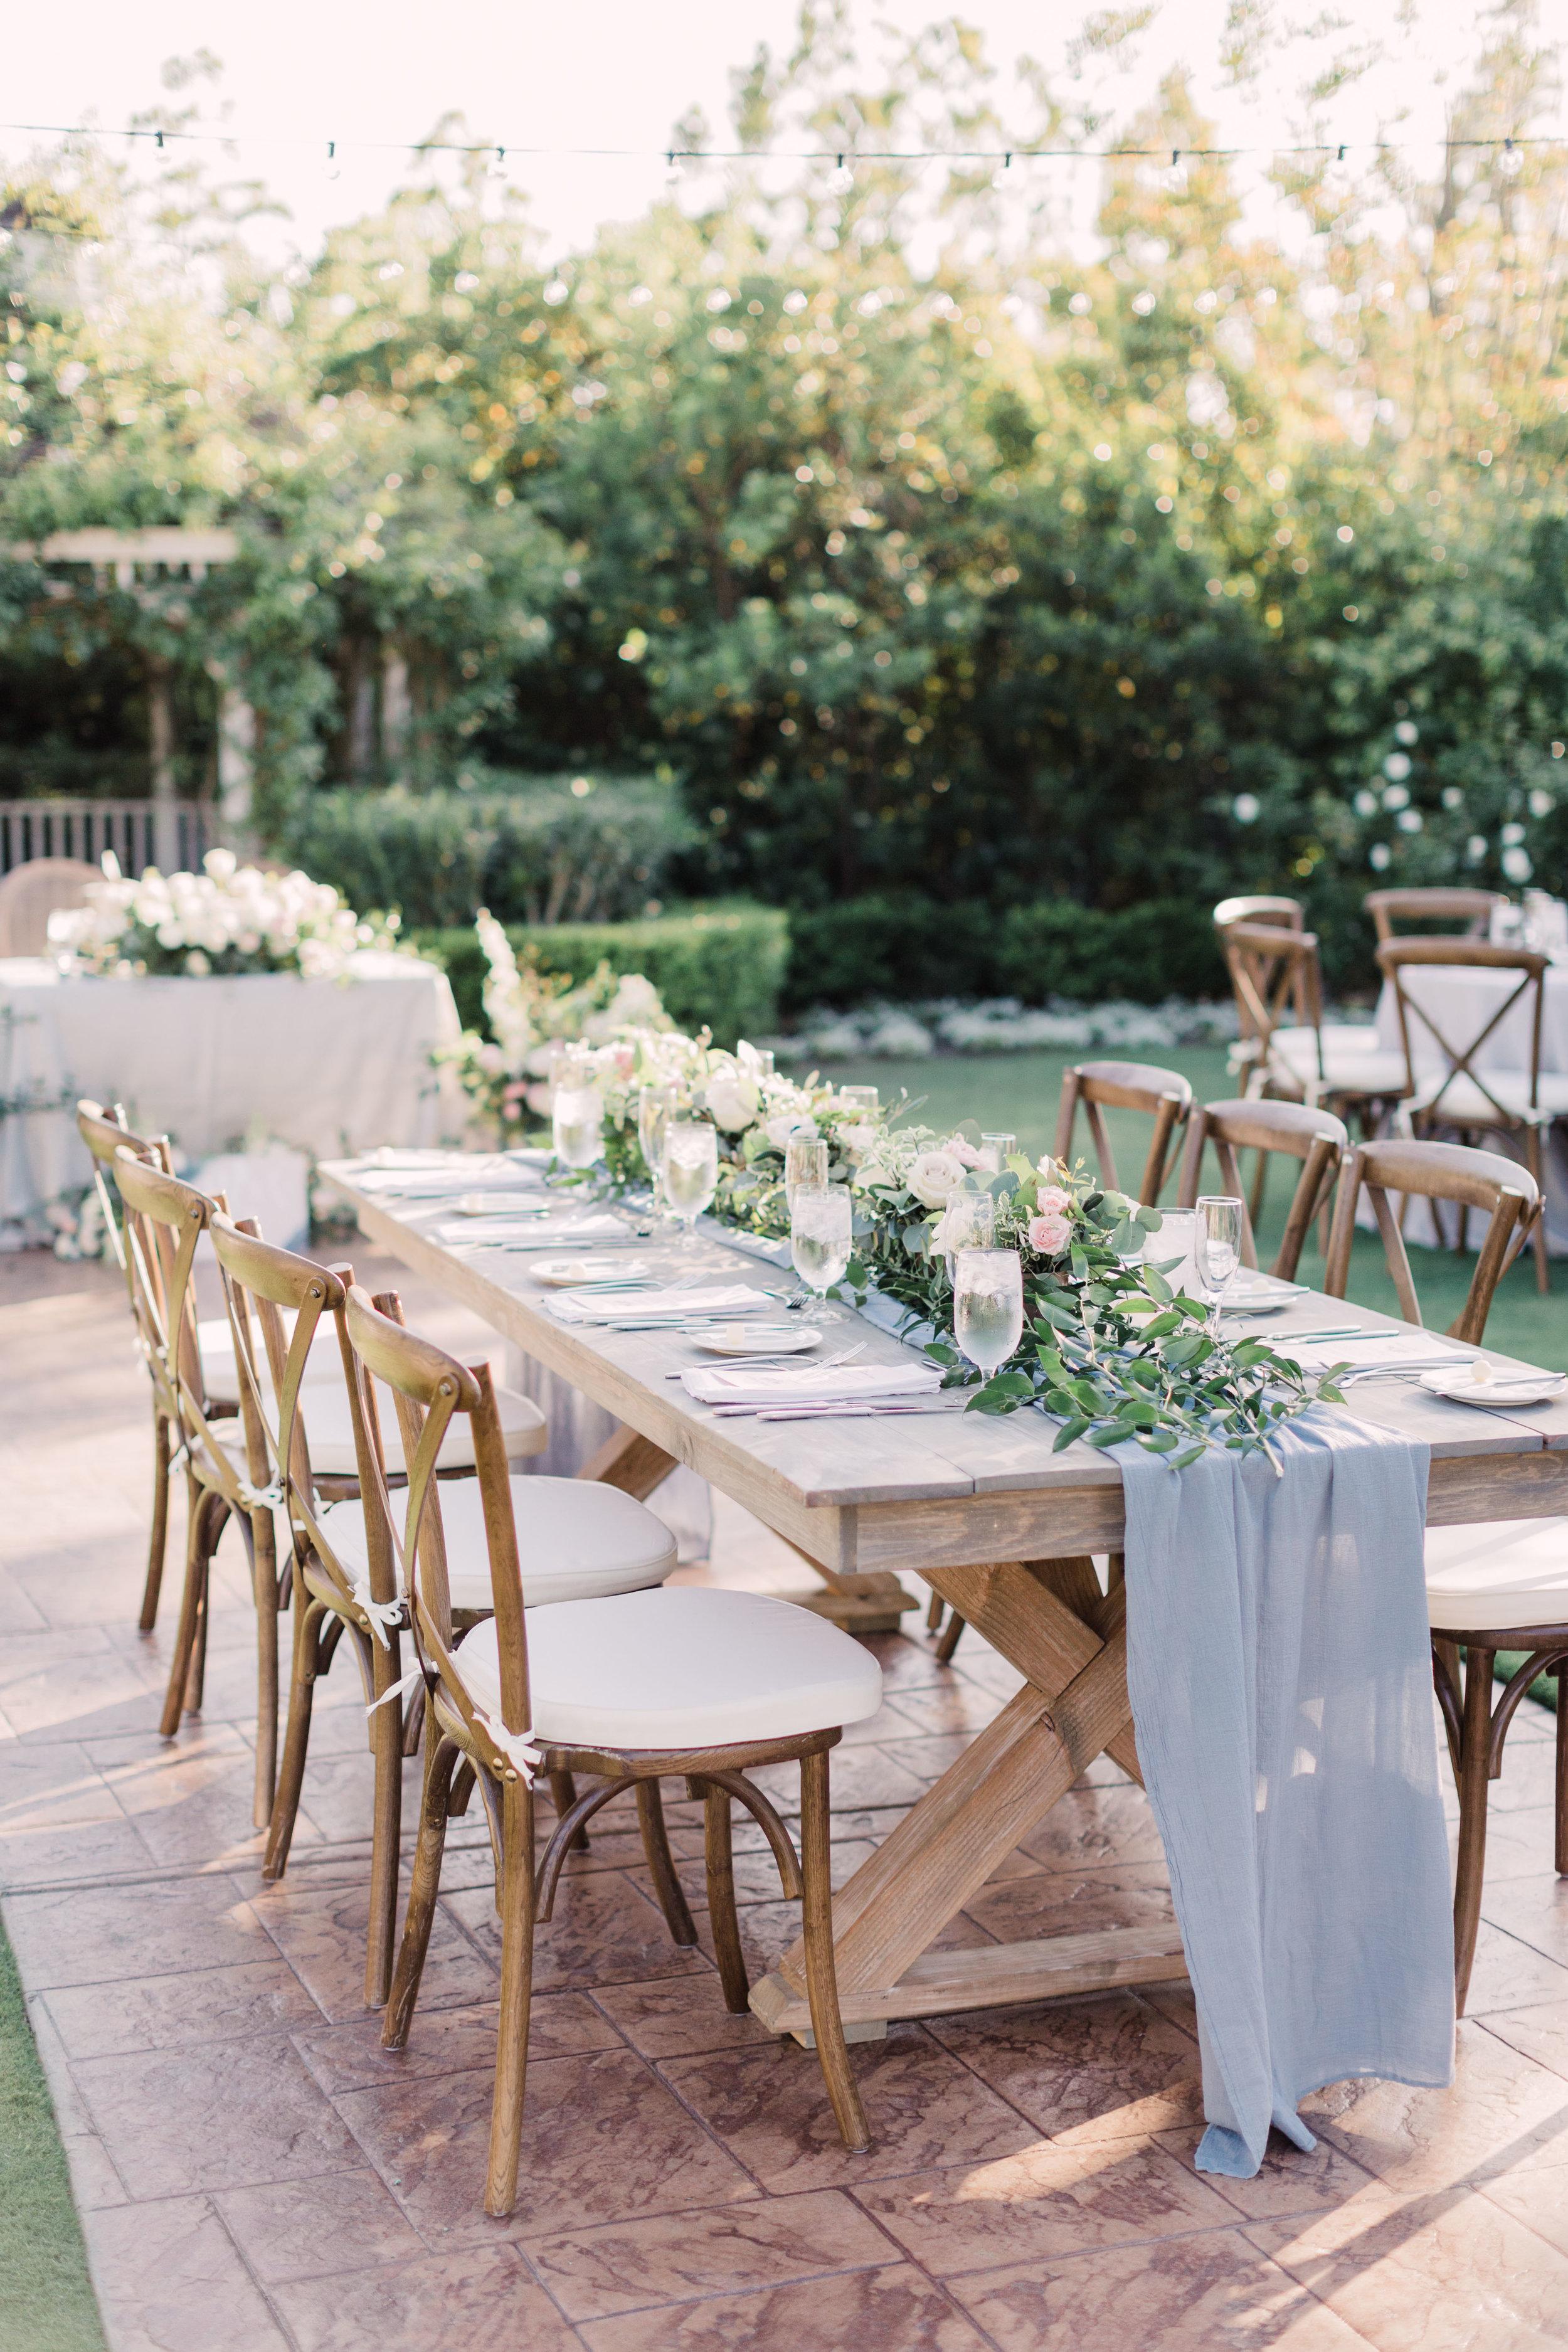 0913_Pacas_Carmel_Mountain_Ranch_Country_Club_San_Diego_California_Wedding_Devon_Donnahoo_Photography.jpg